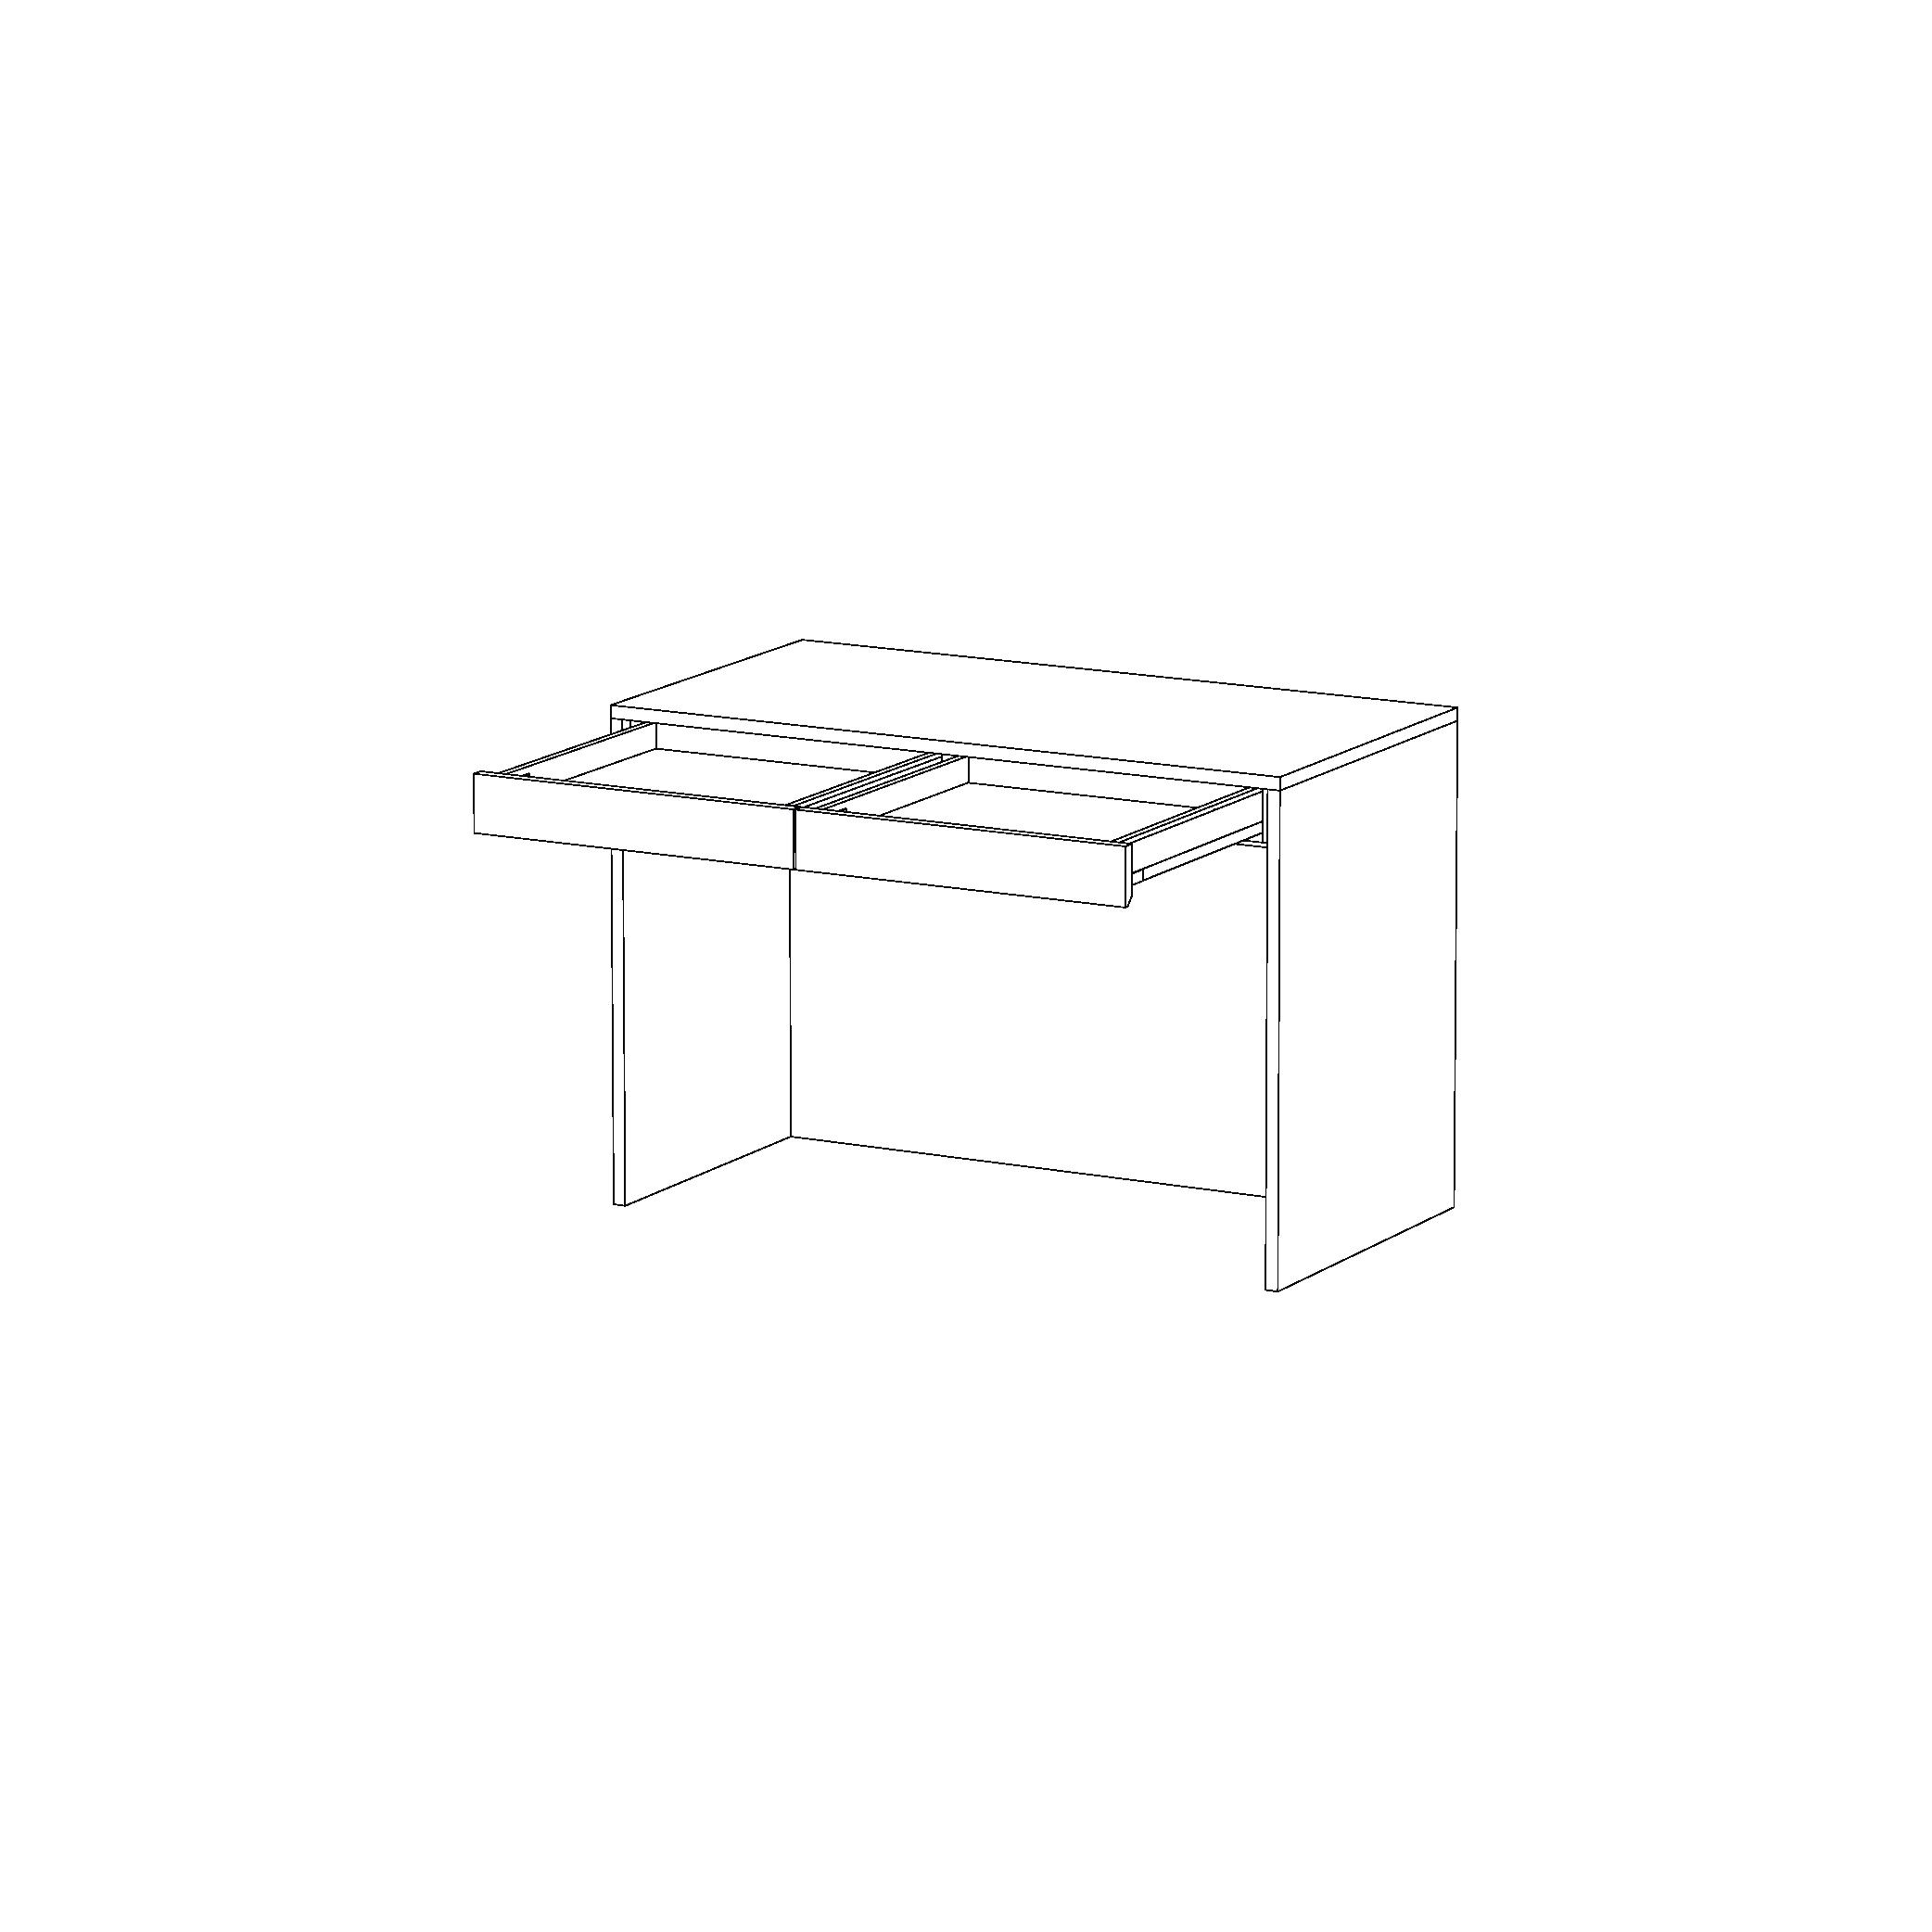 WORK 2/6